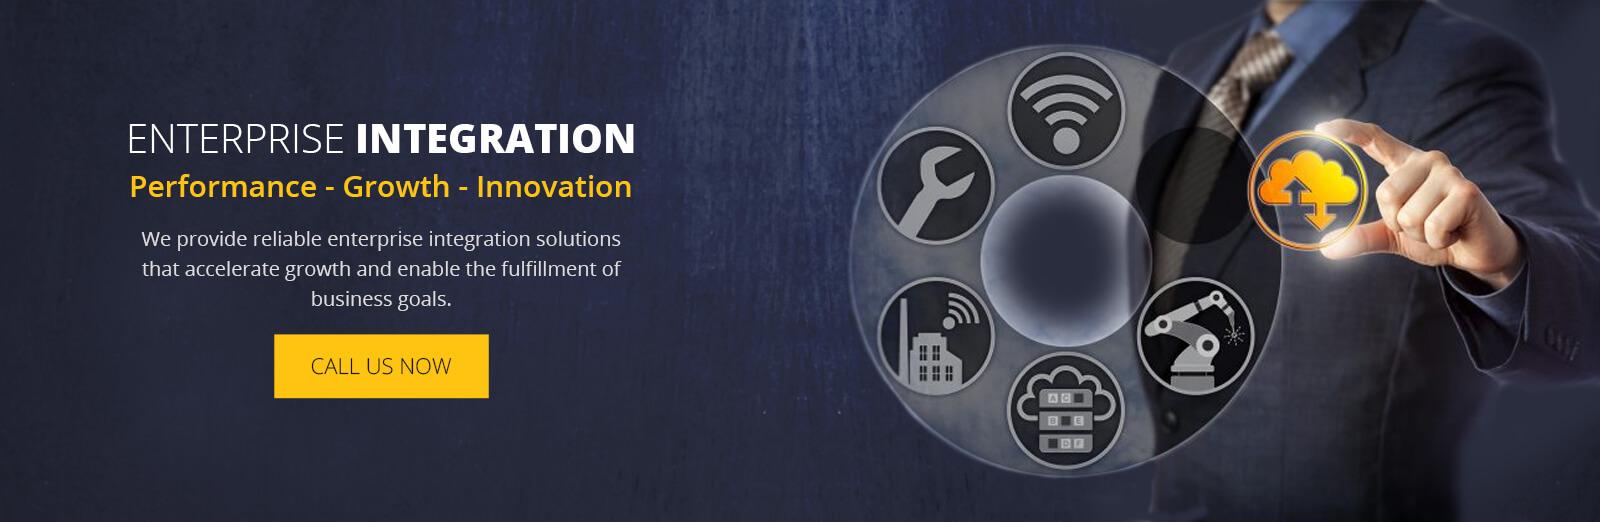 Enterprise Application Integration Solutions